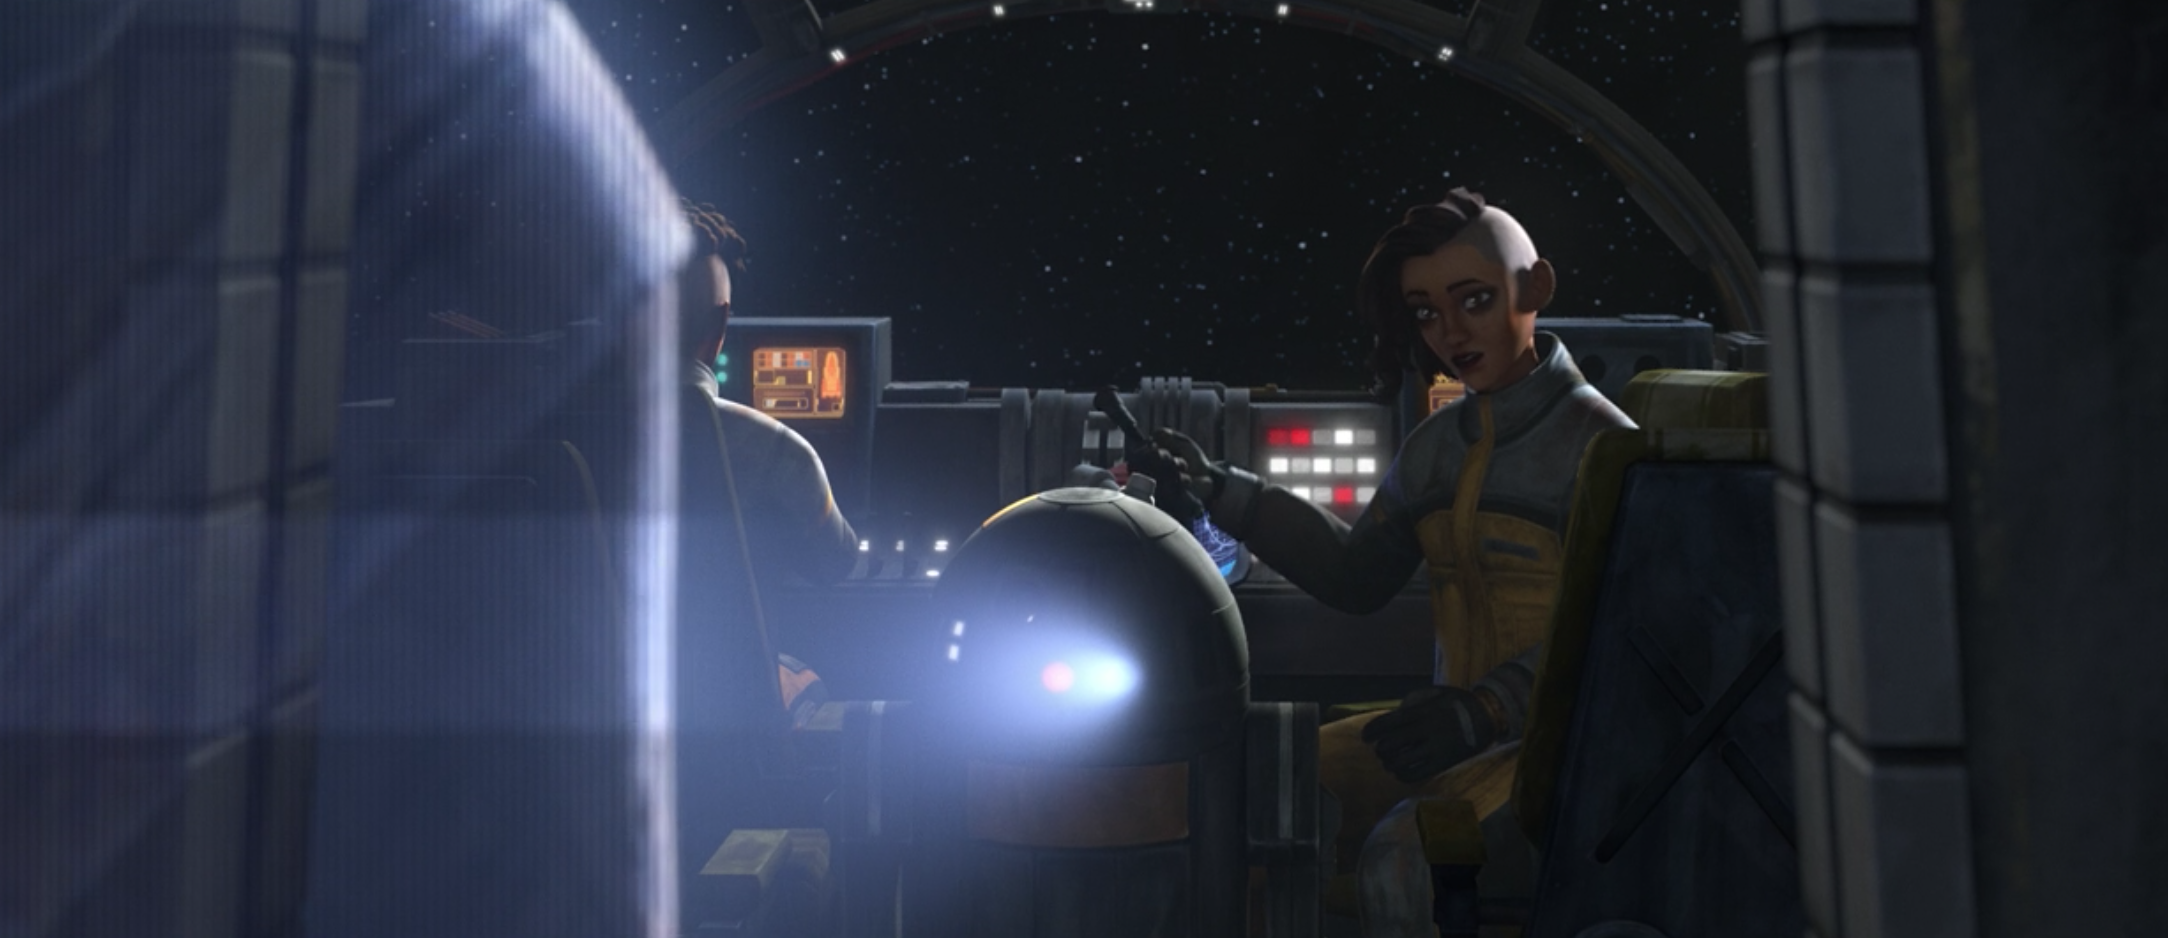 Rafa Martez speaking to a mysterious hologram